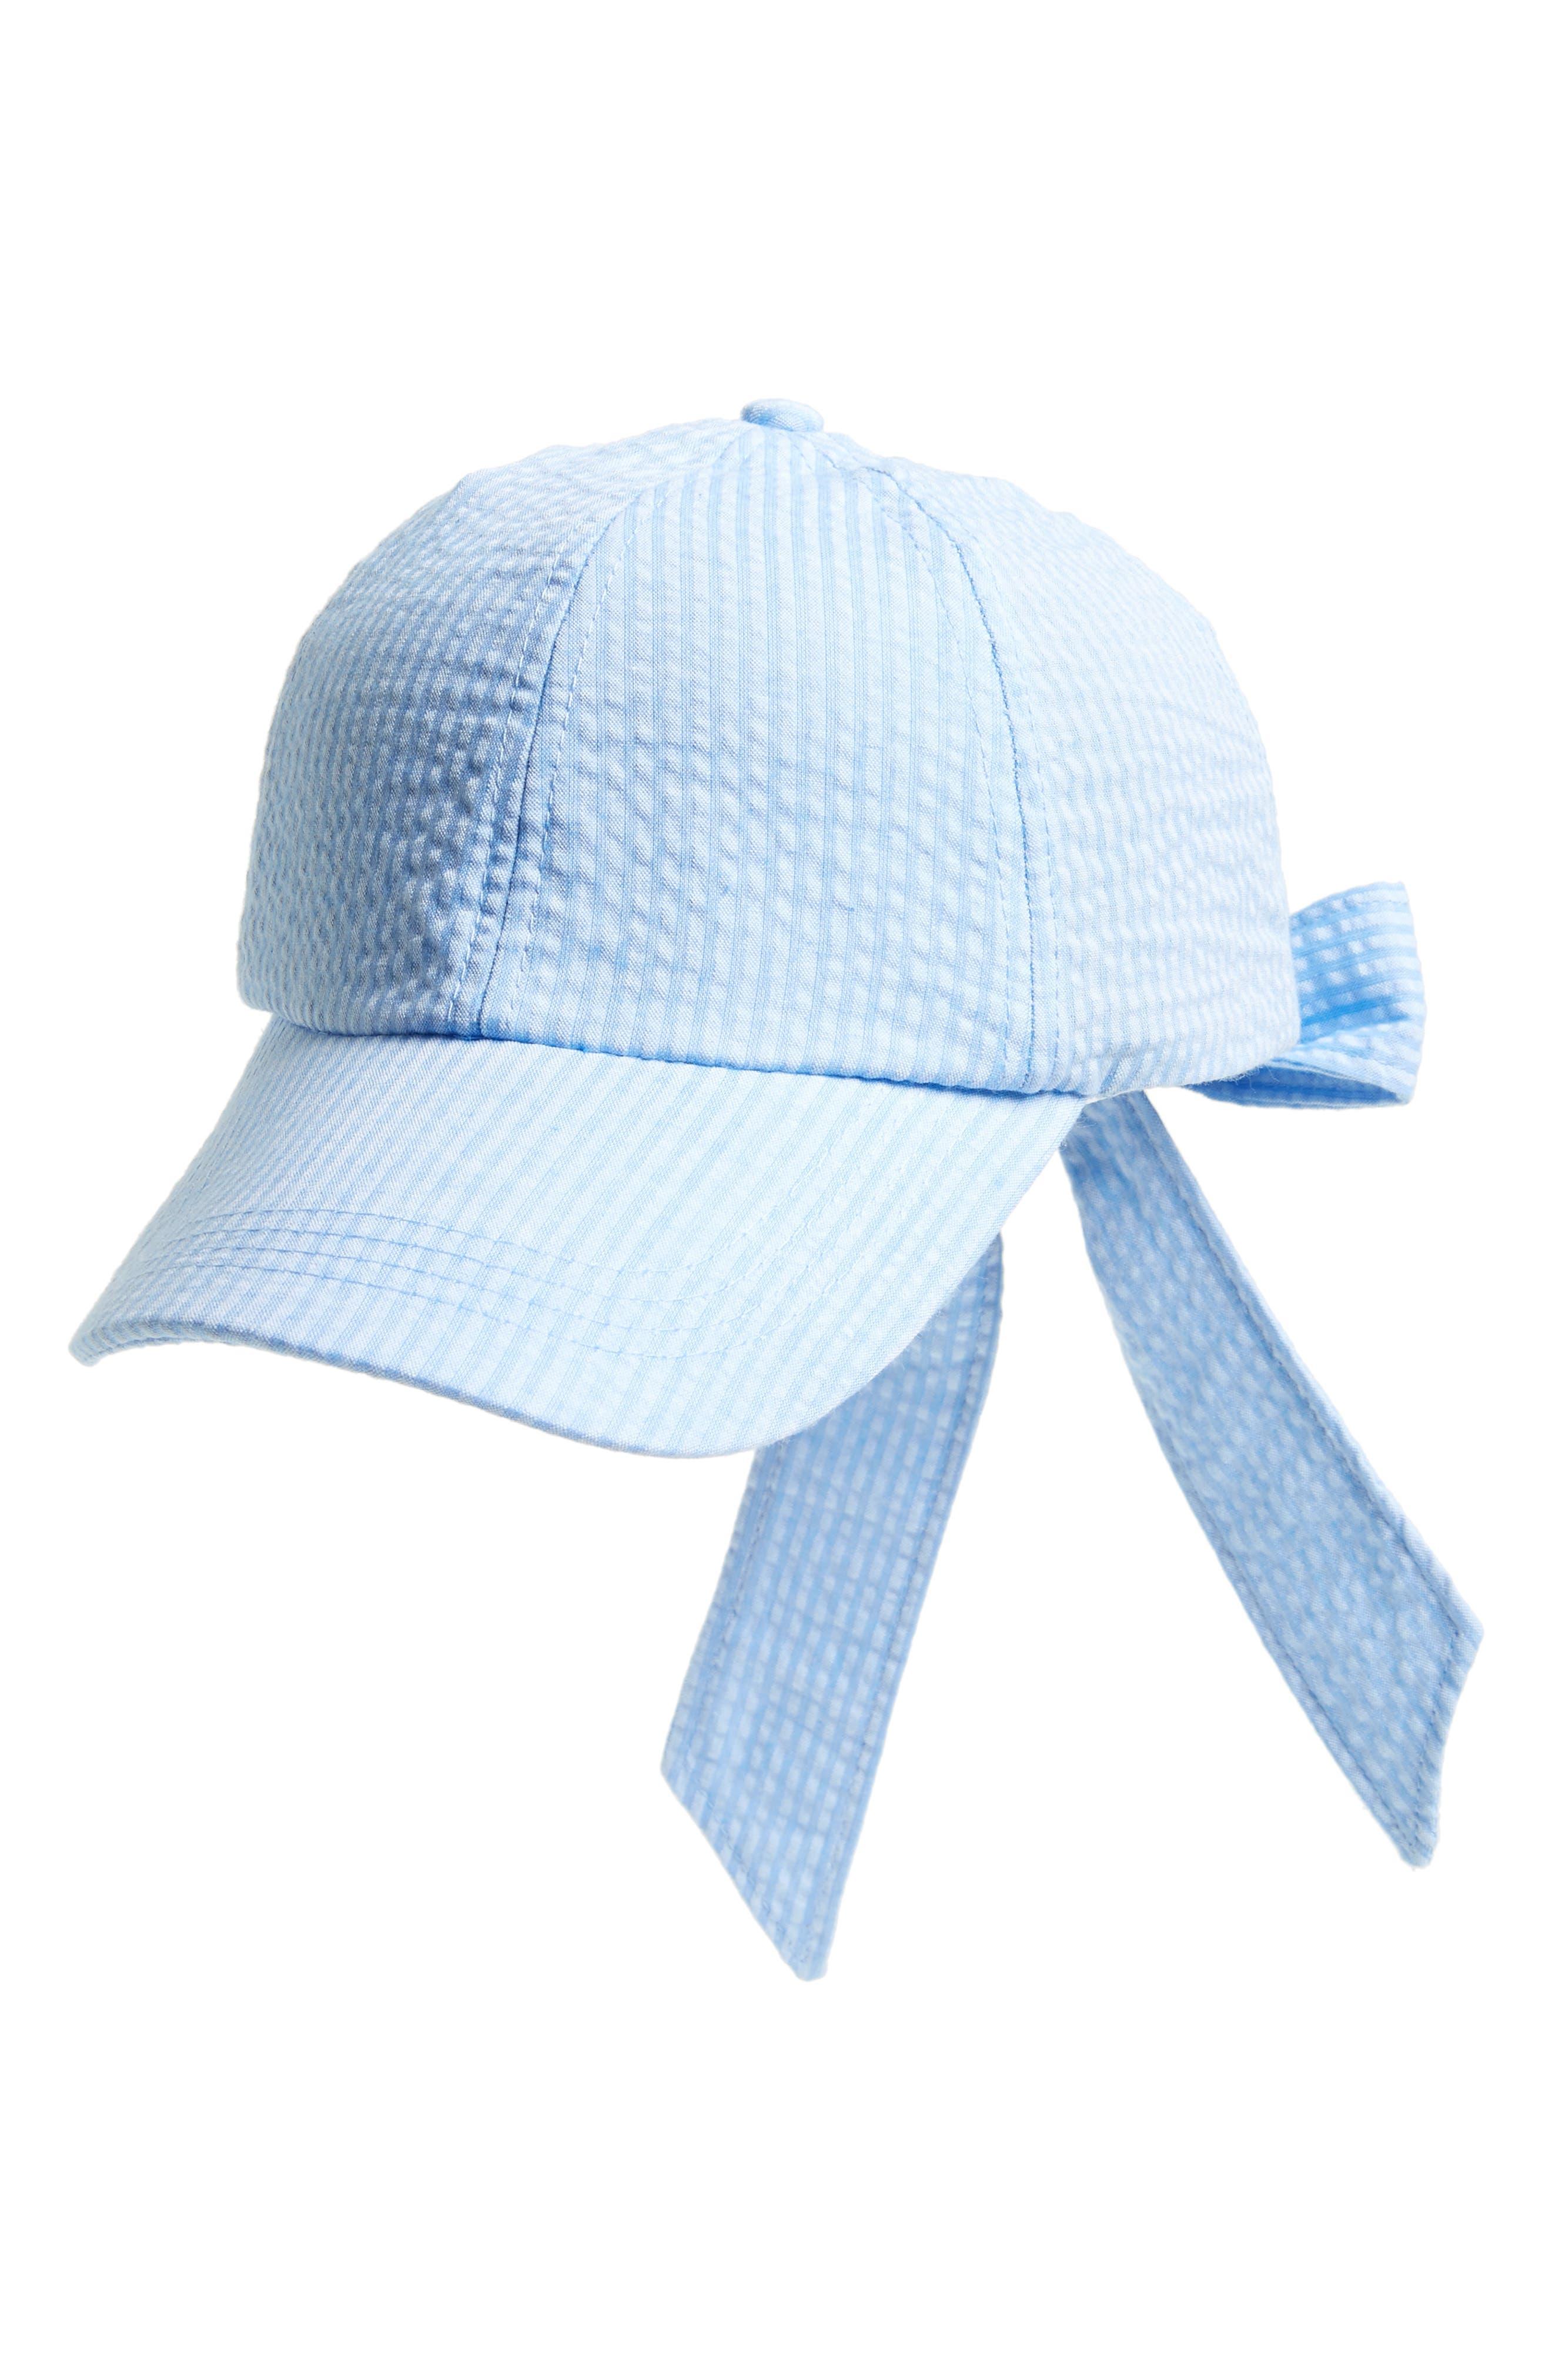 Alternate Image 1 Selected - Topshop Stripe Bow Back Cap